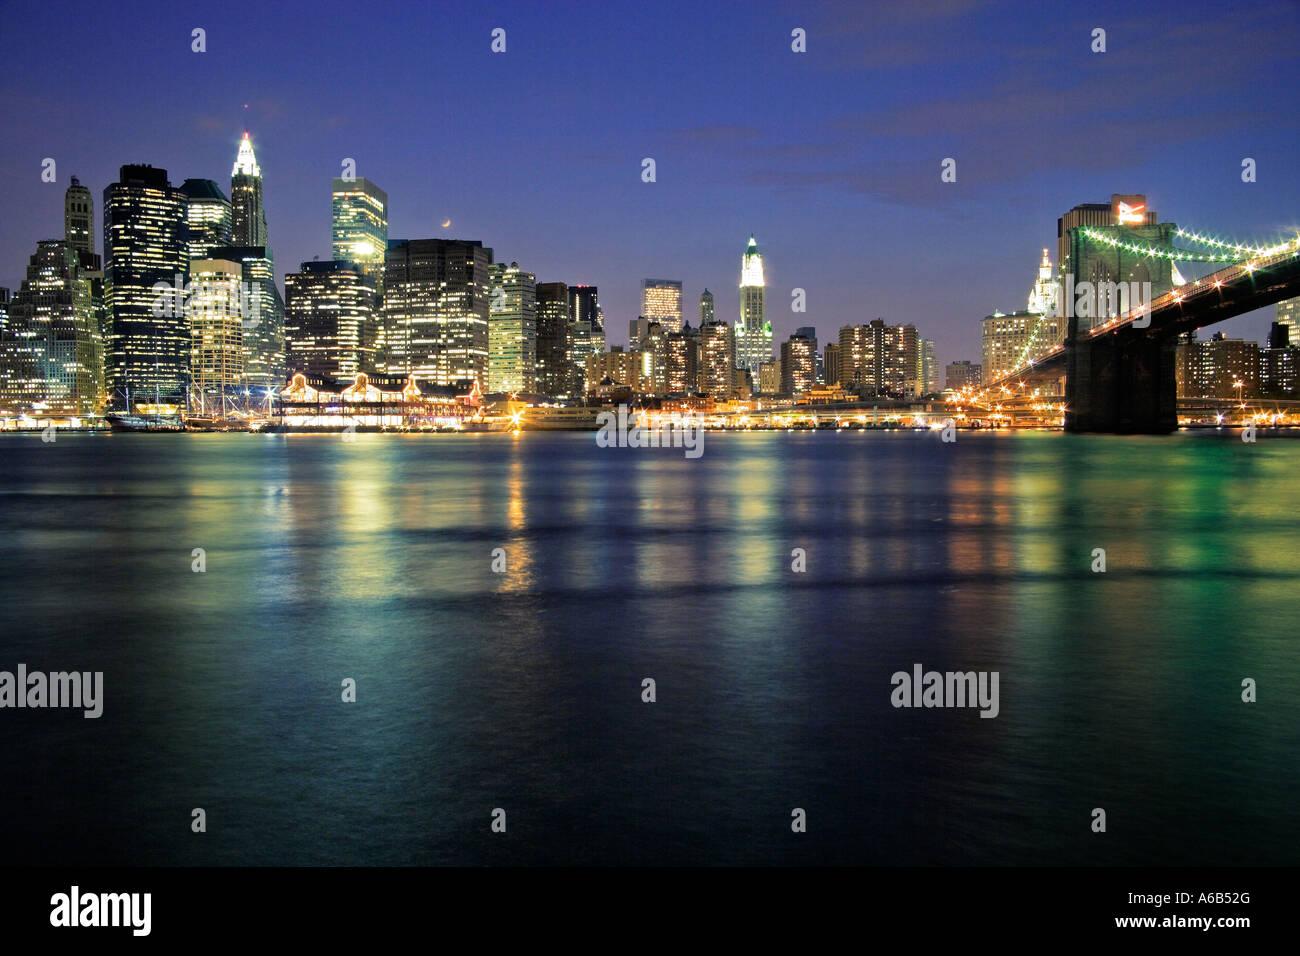 skyline of Manhattan by night twilight Financial District NYC New York City - Stock Image